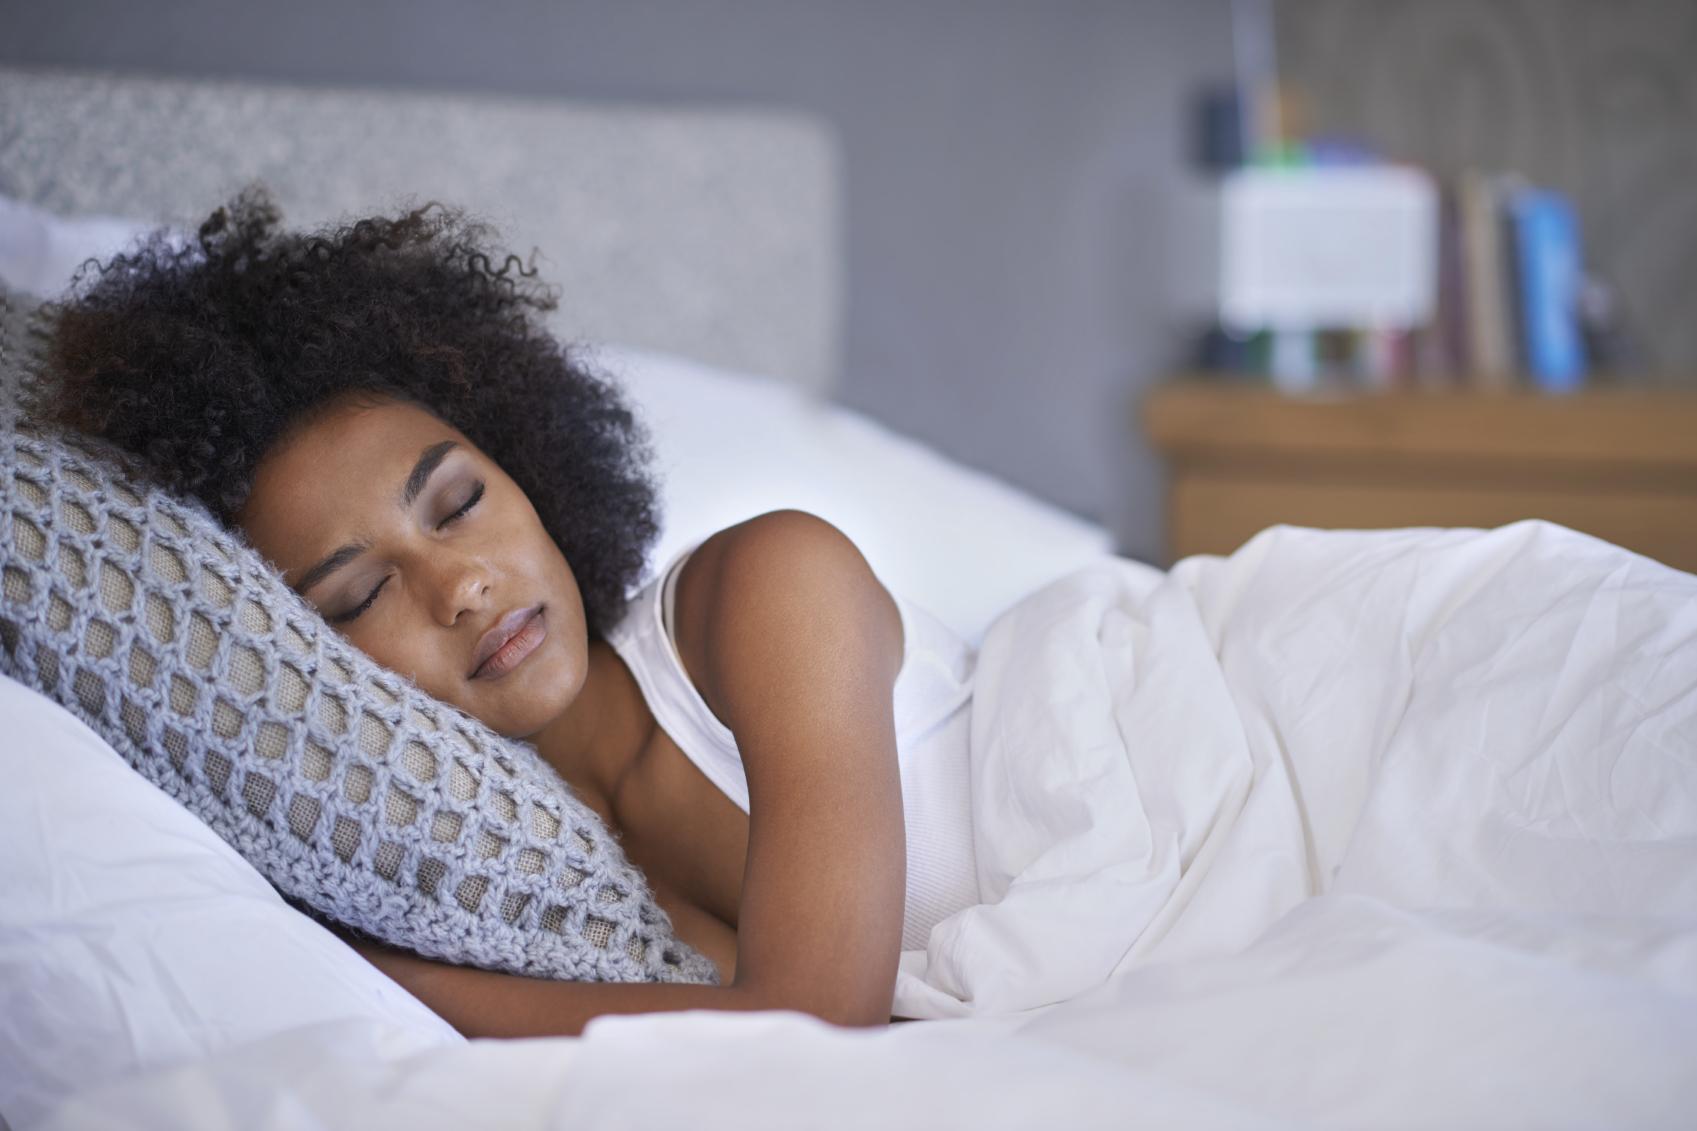 Good For You - Get Some Sleep!